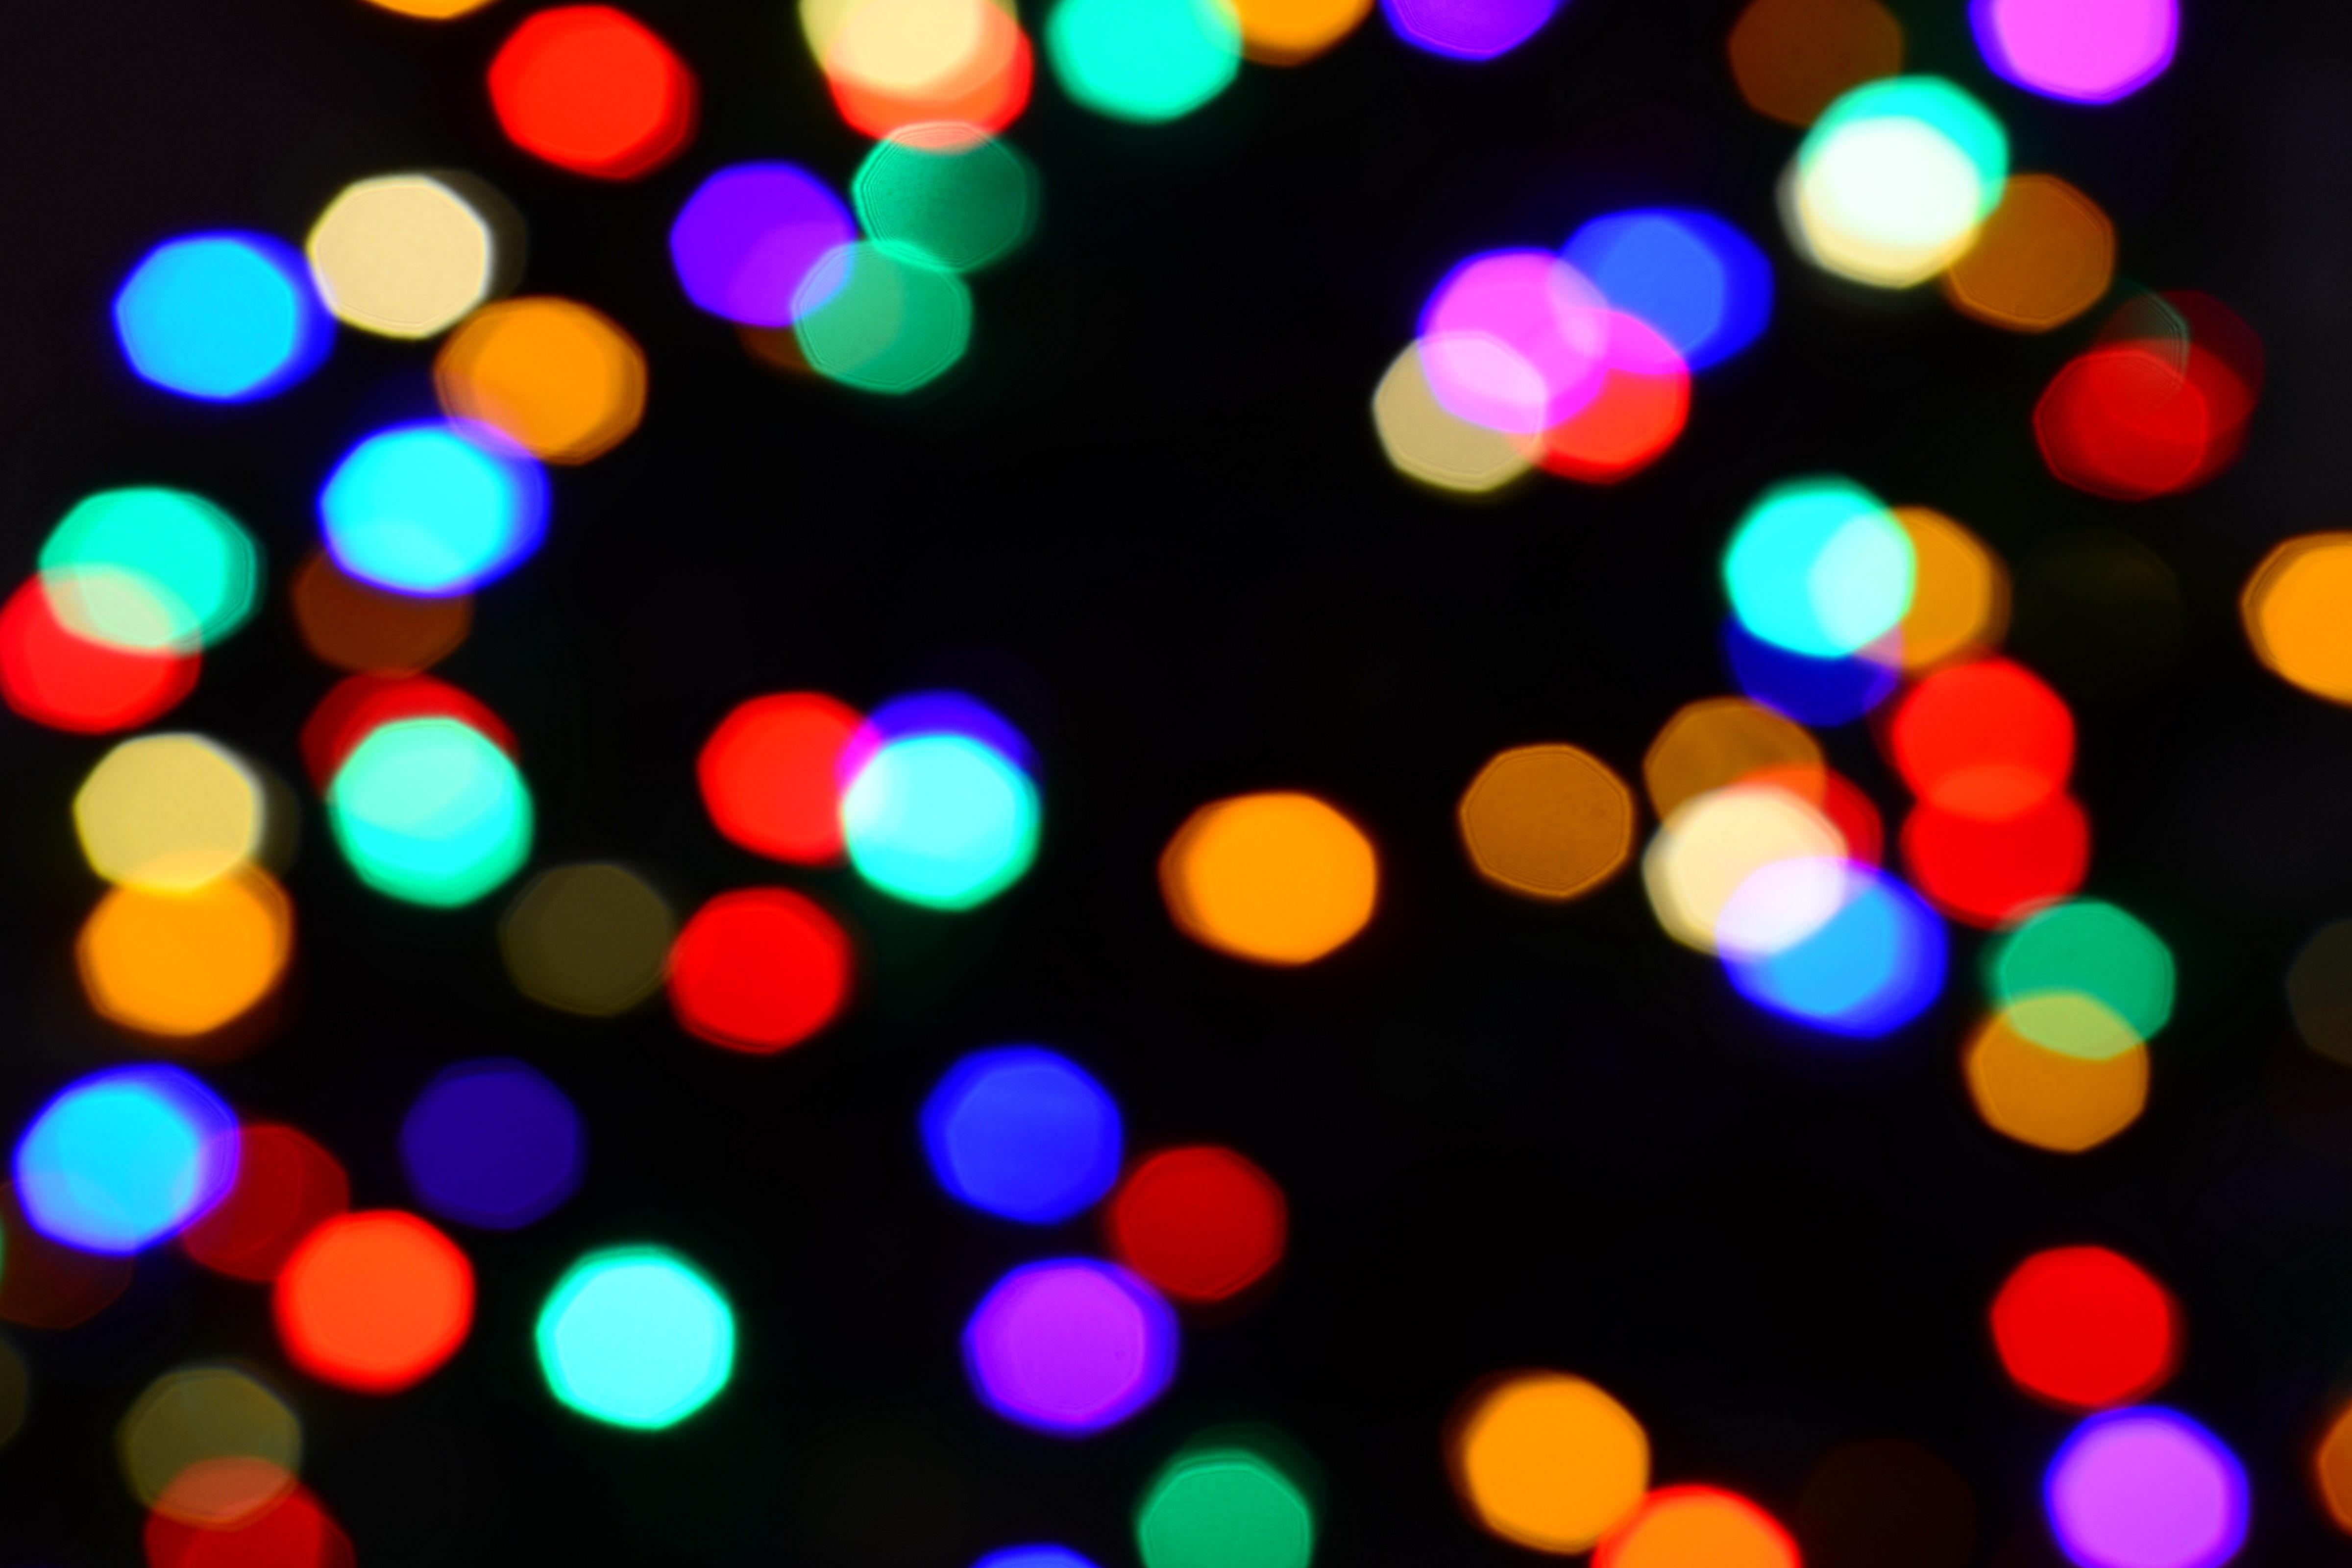 10 Christmas Light Bokeh Textures